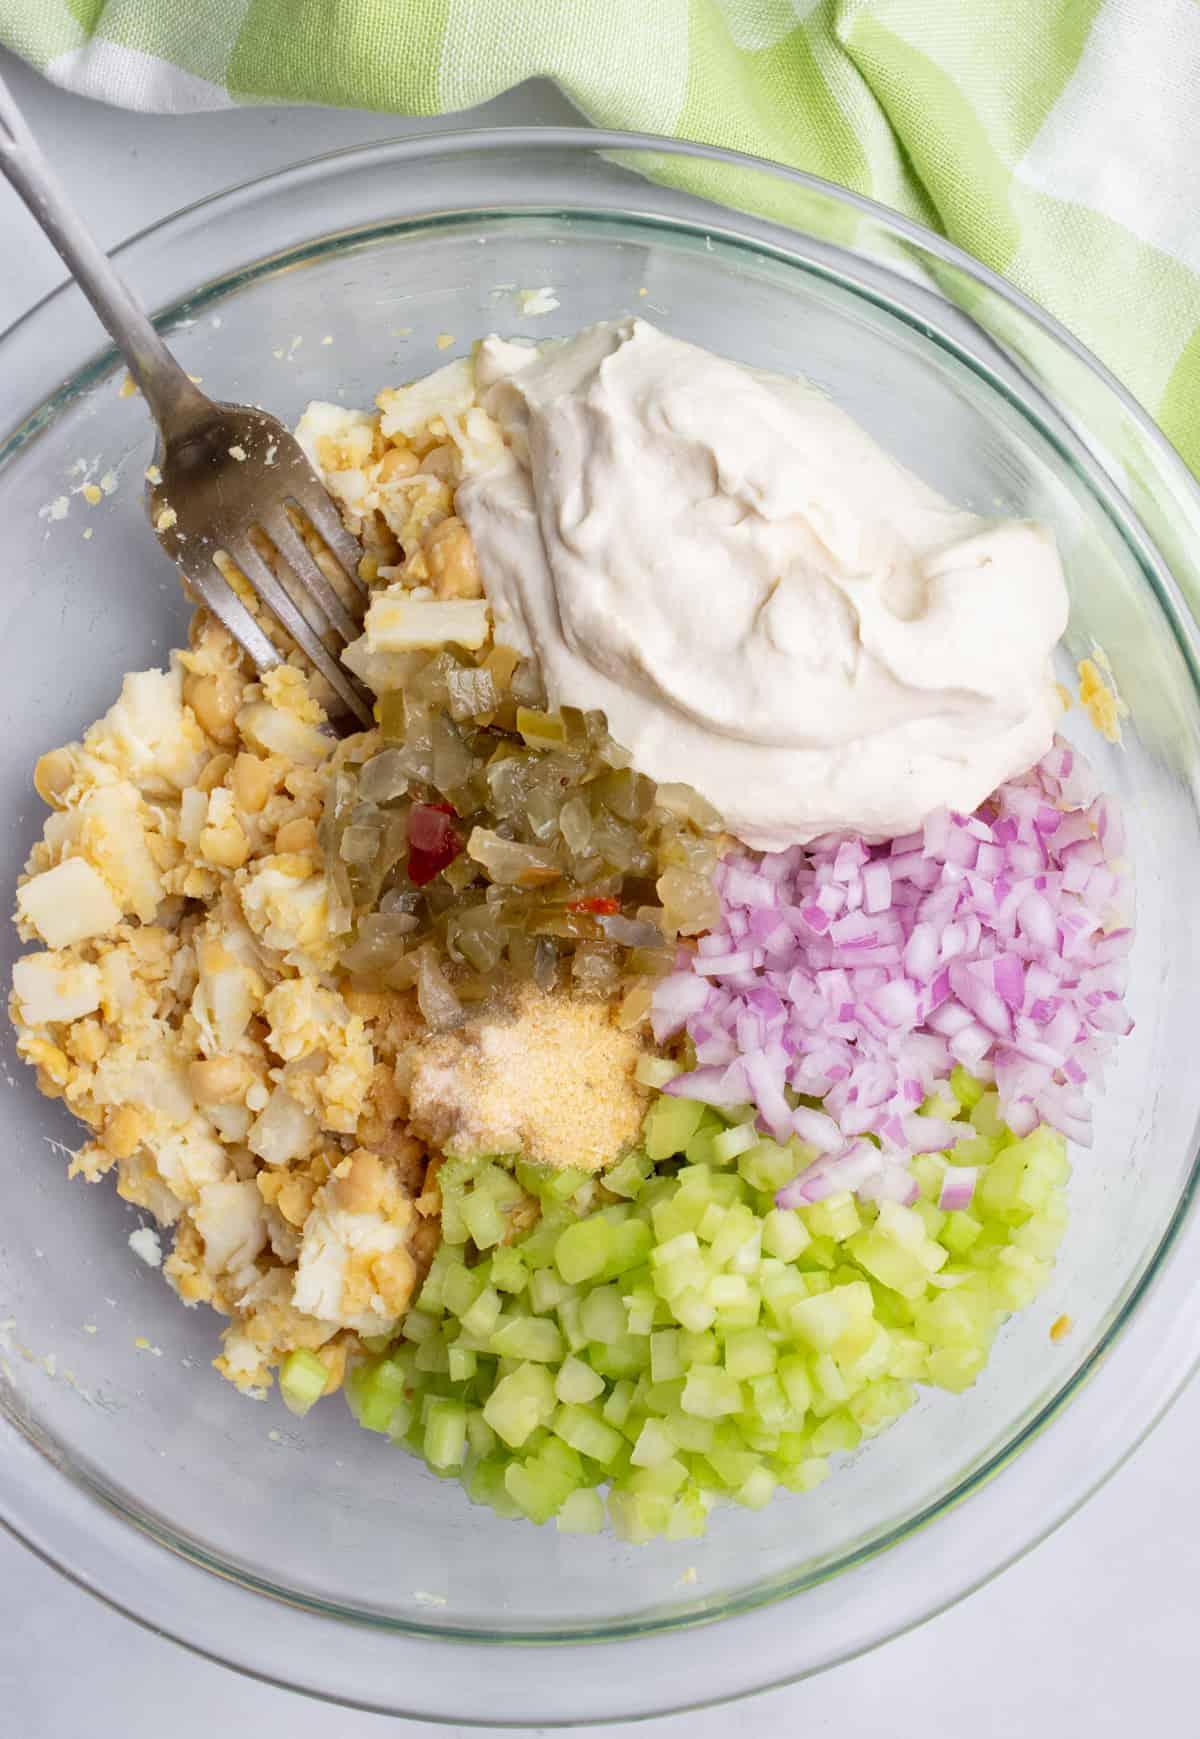 A bowl of vegan tuna salad ingredients.